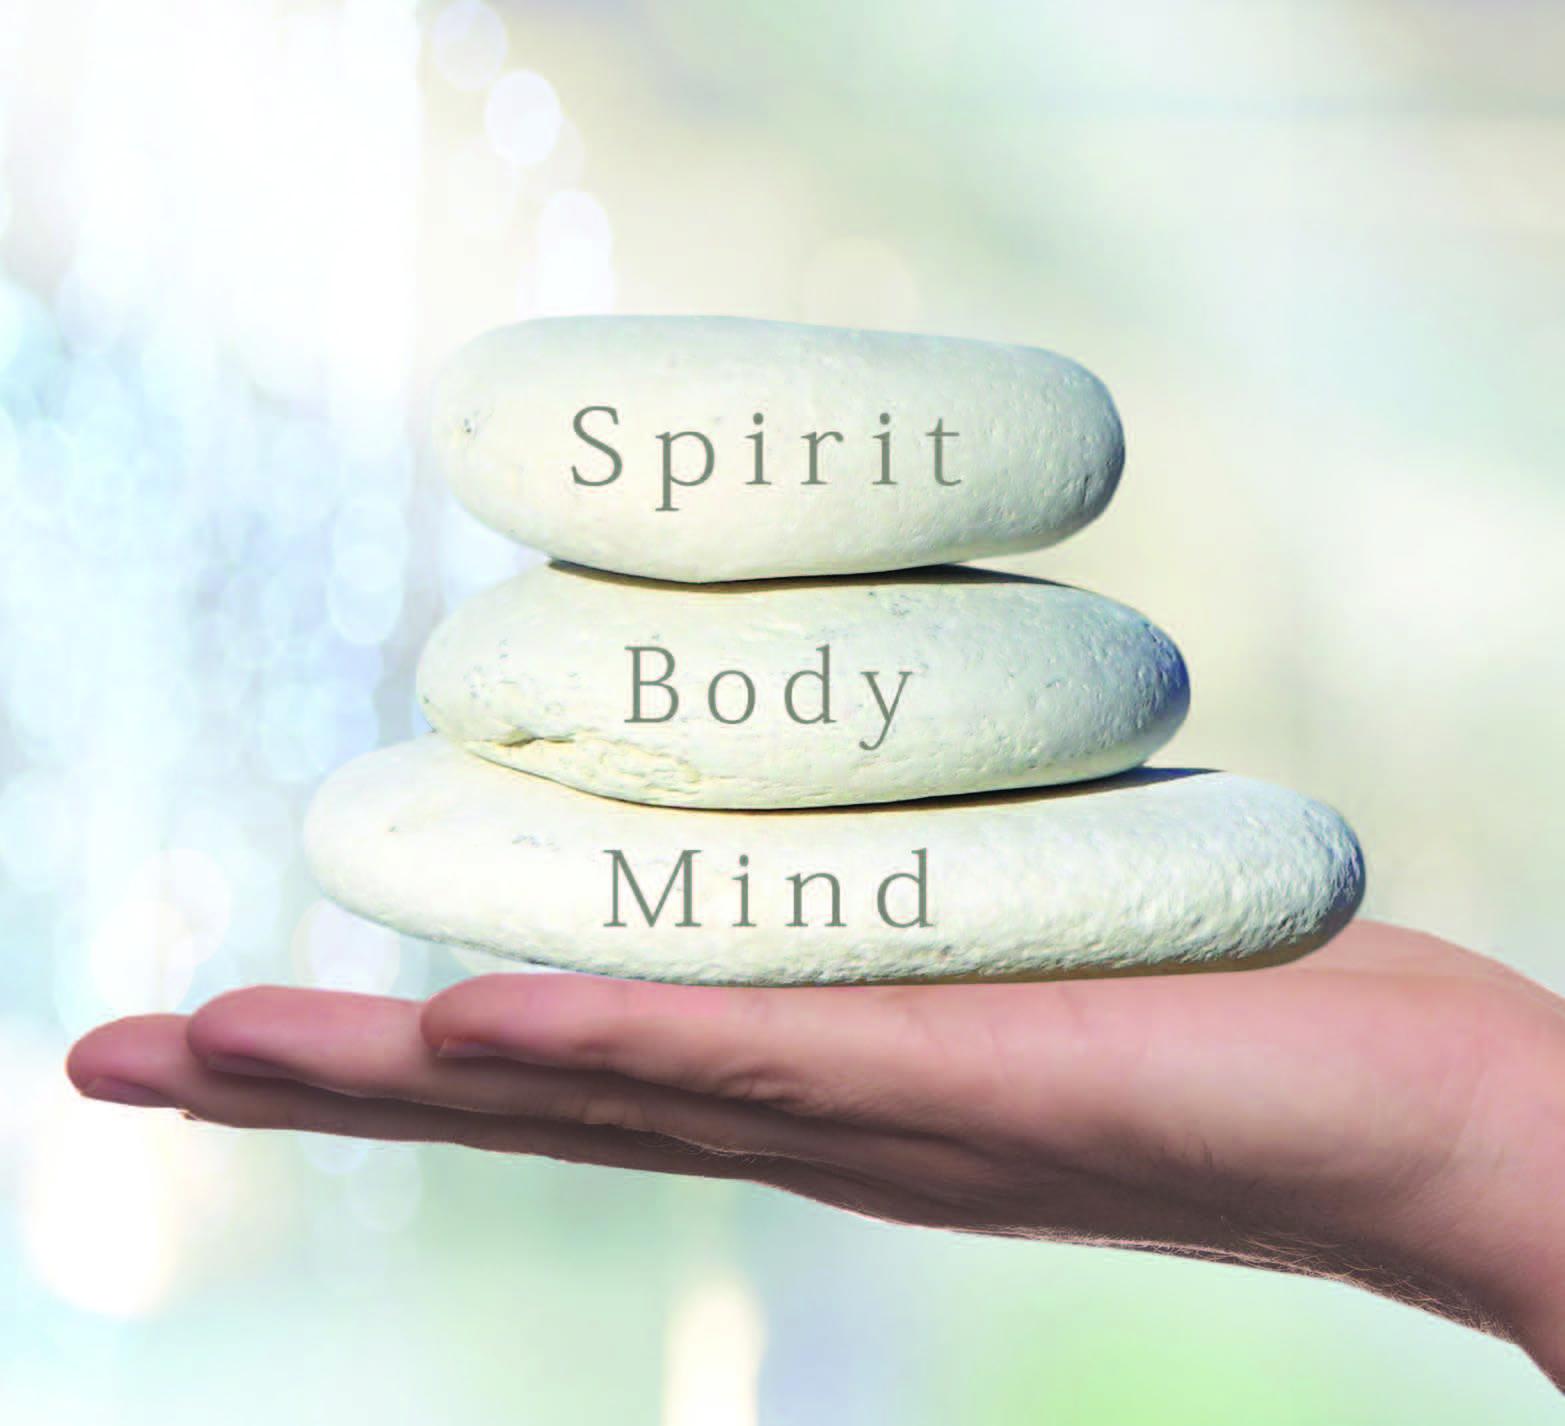 spirit, body and mind